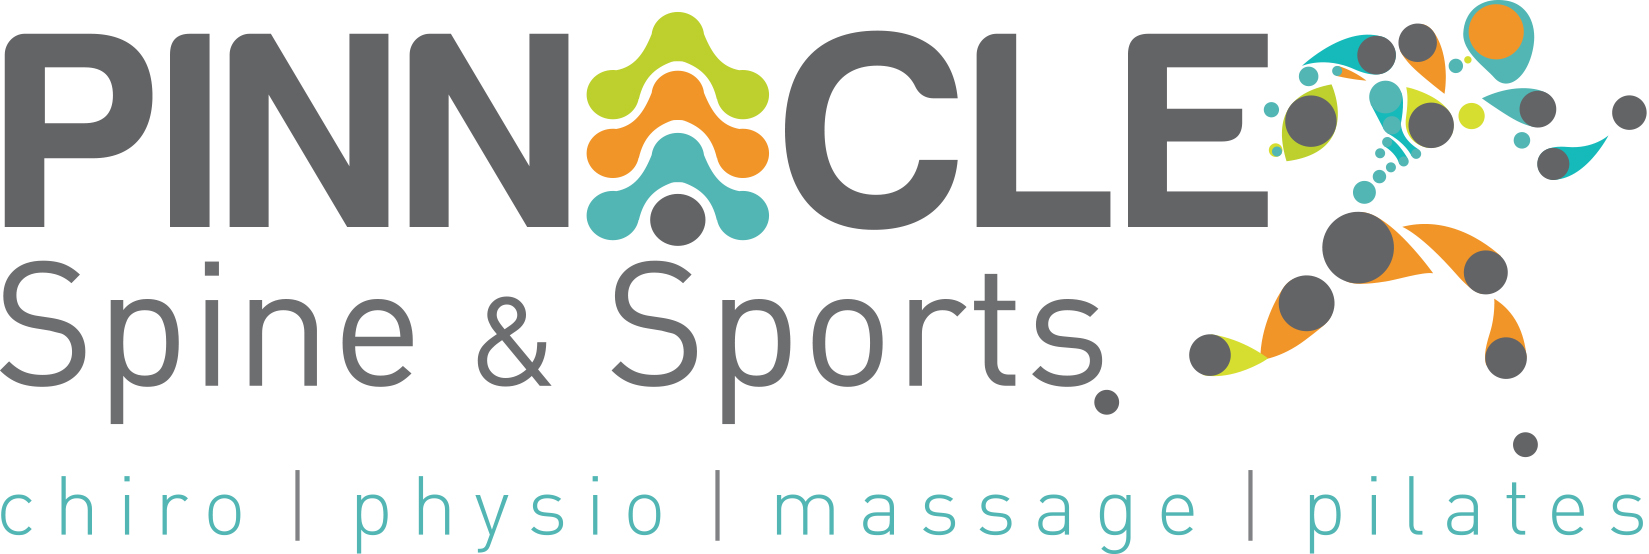 Pinnacle Logo Final.jpg